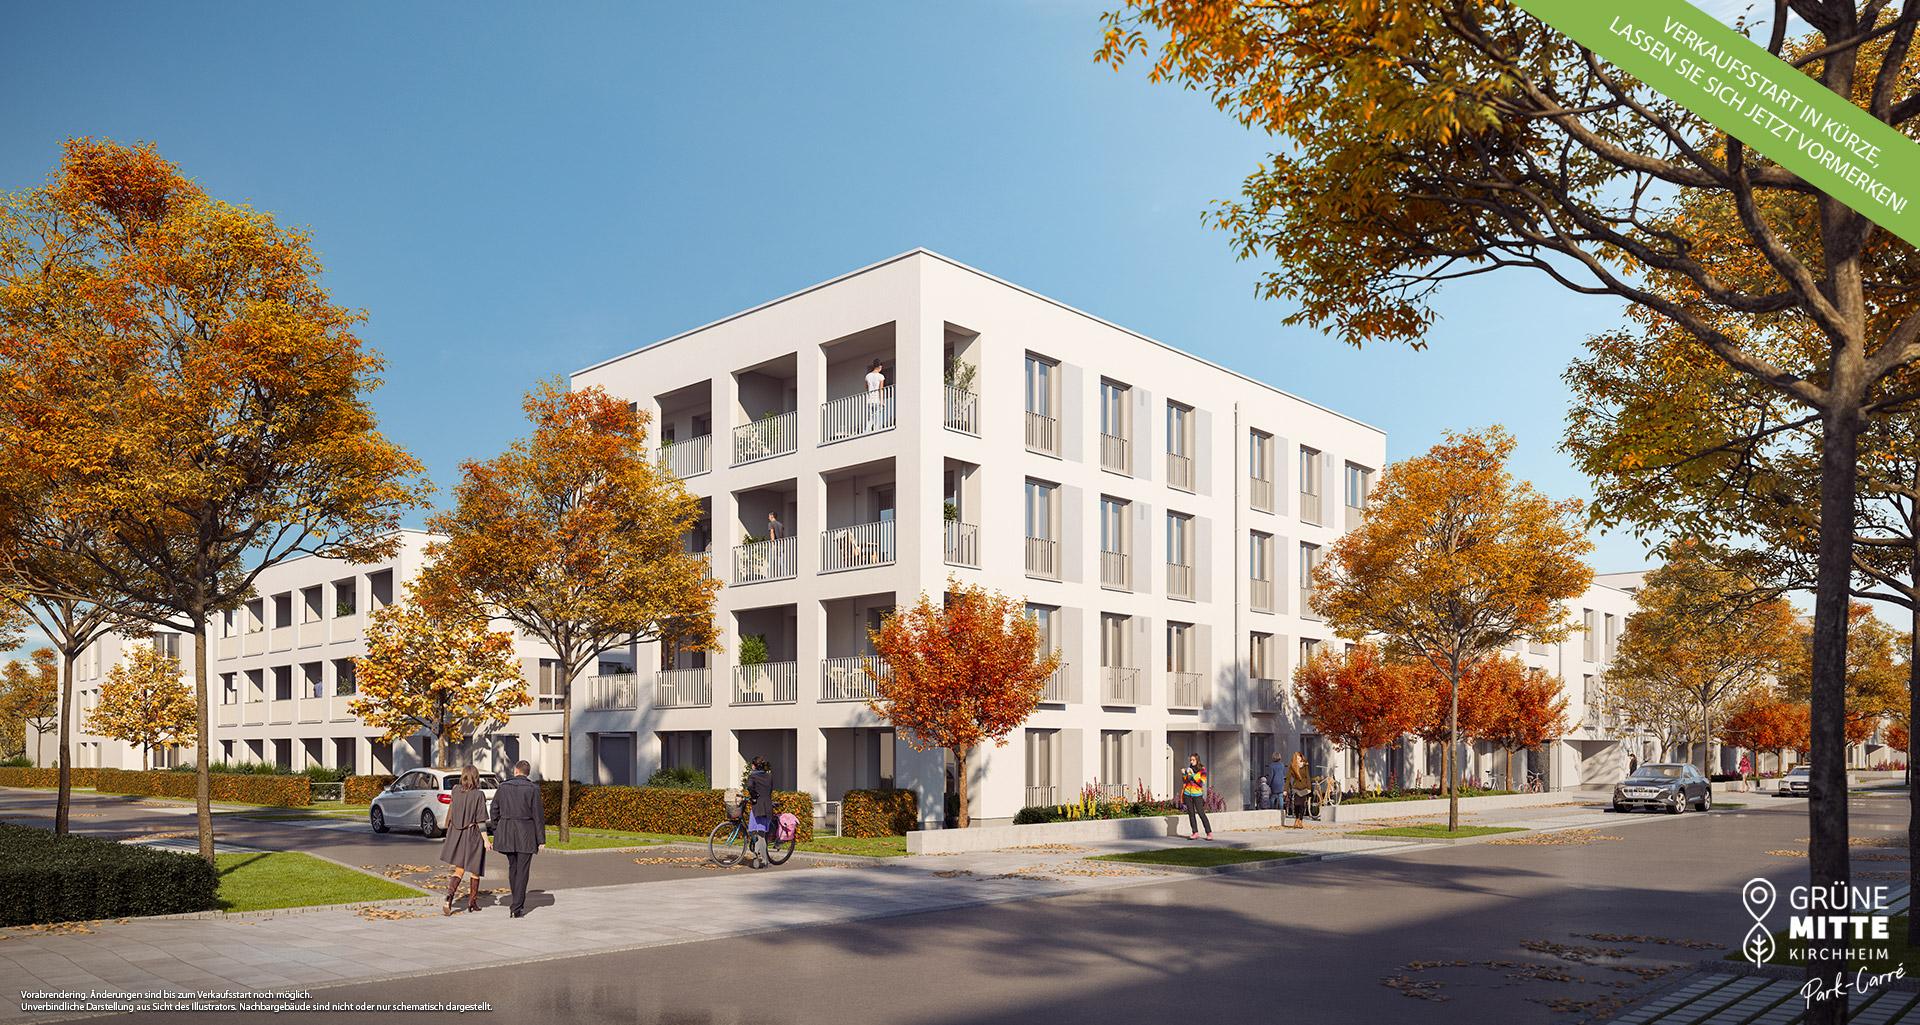 Eigentumswohnungen Kirchheim bei München: Grüne Mitte Kirchheim - Park-Carré